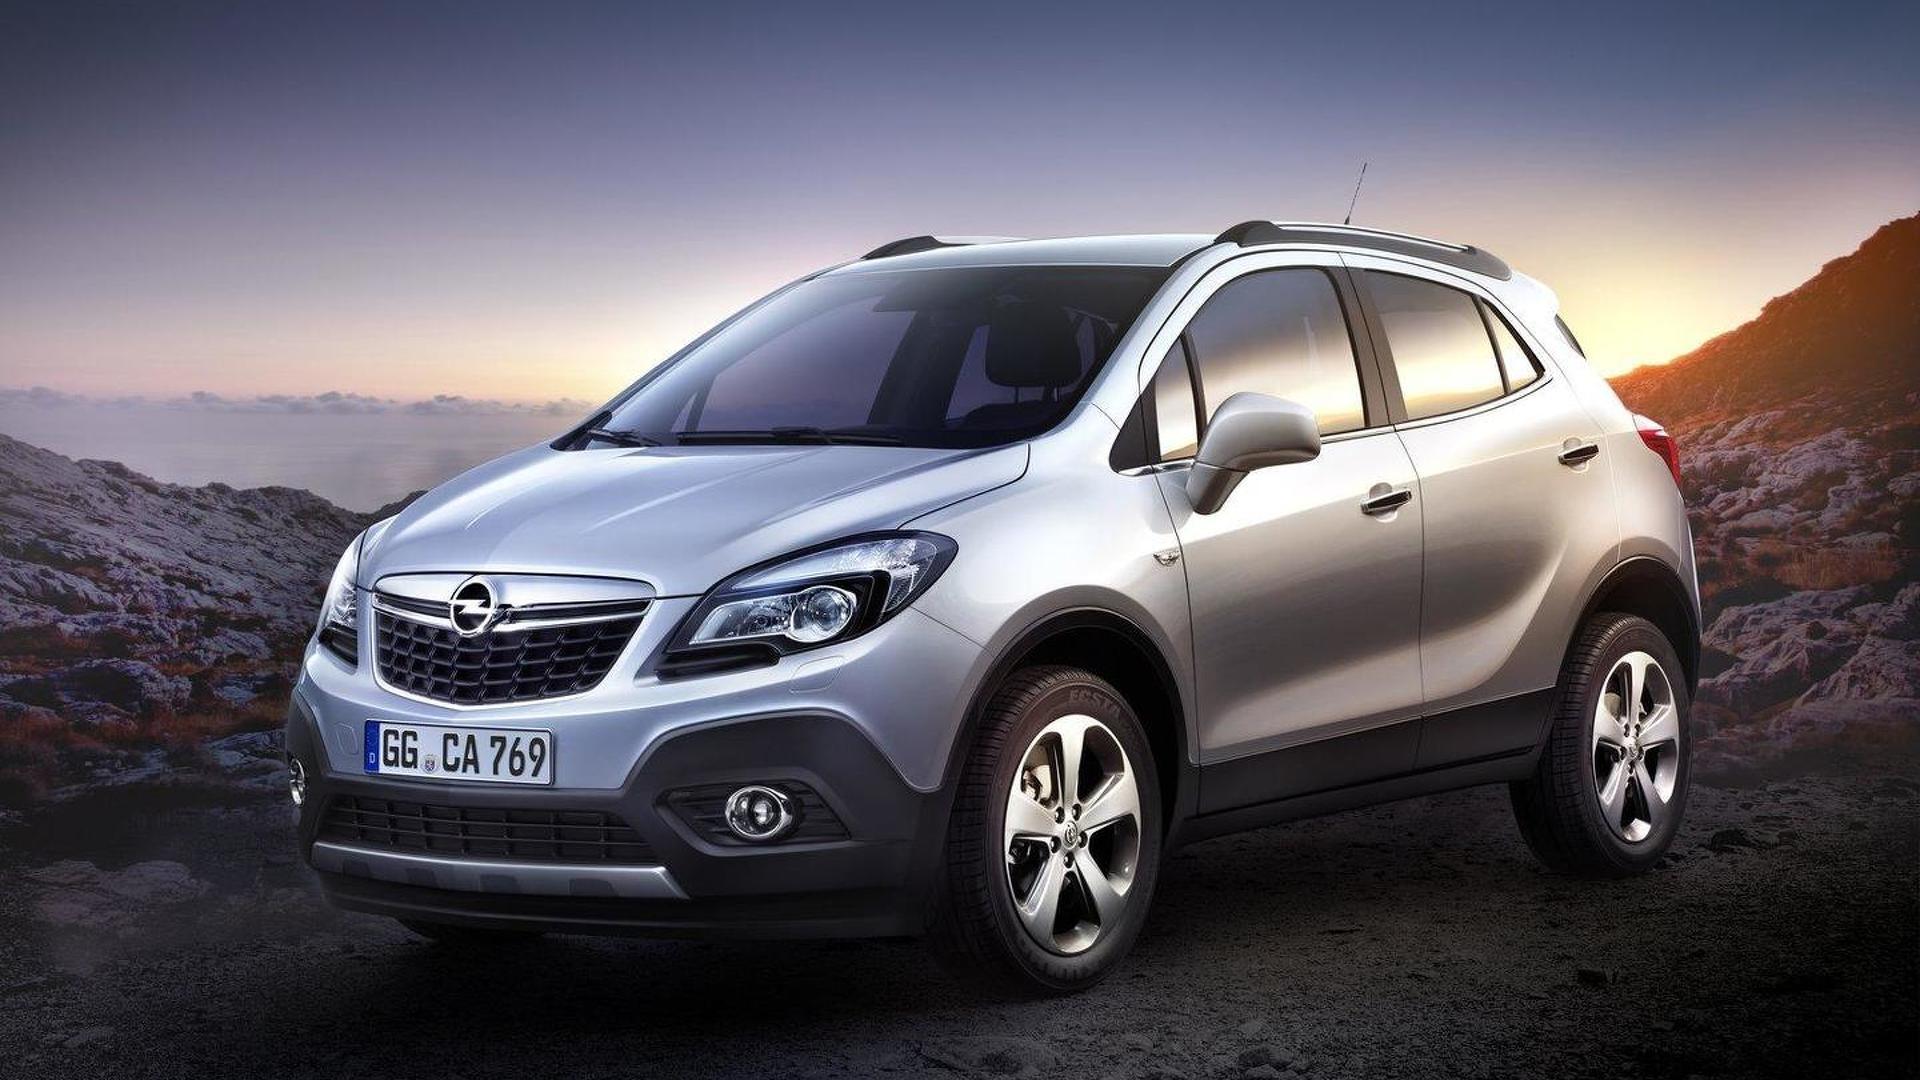 2013 Opel Mokka and Buick Encore revealed [video]